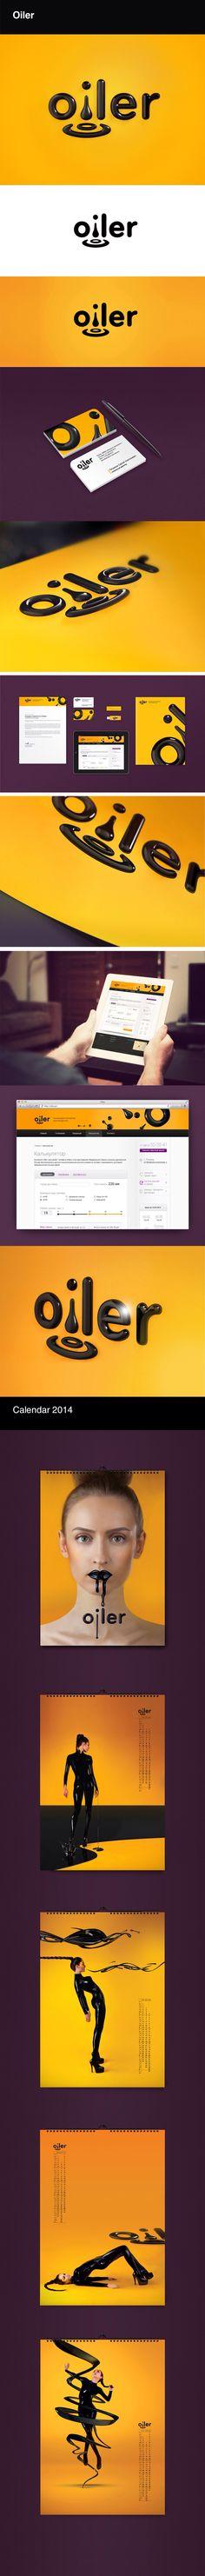 Oiler Identity.